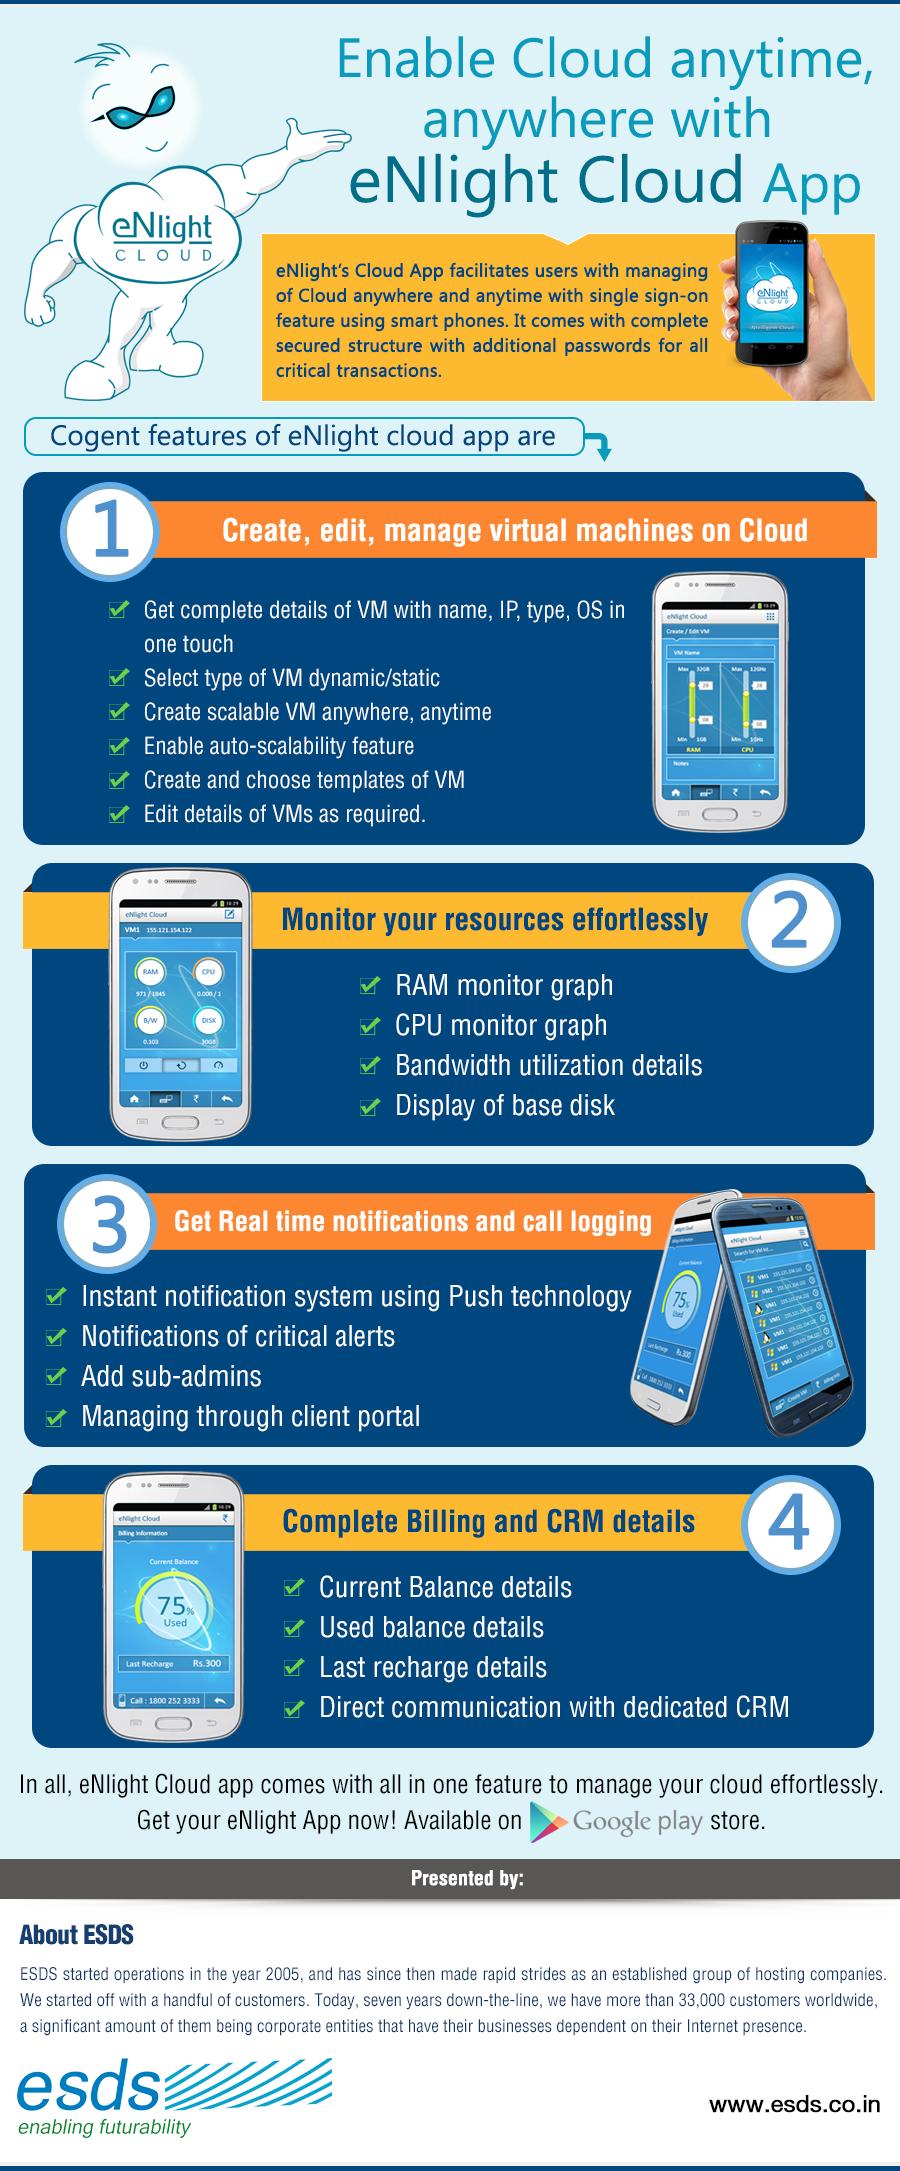 eNlight_cloud_infographic